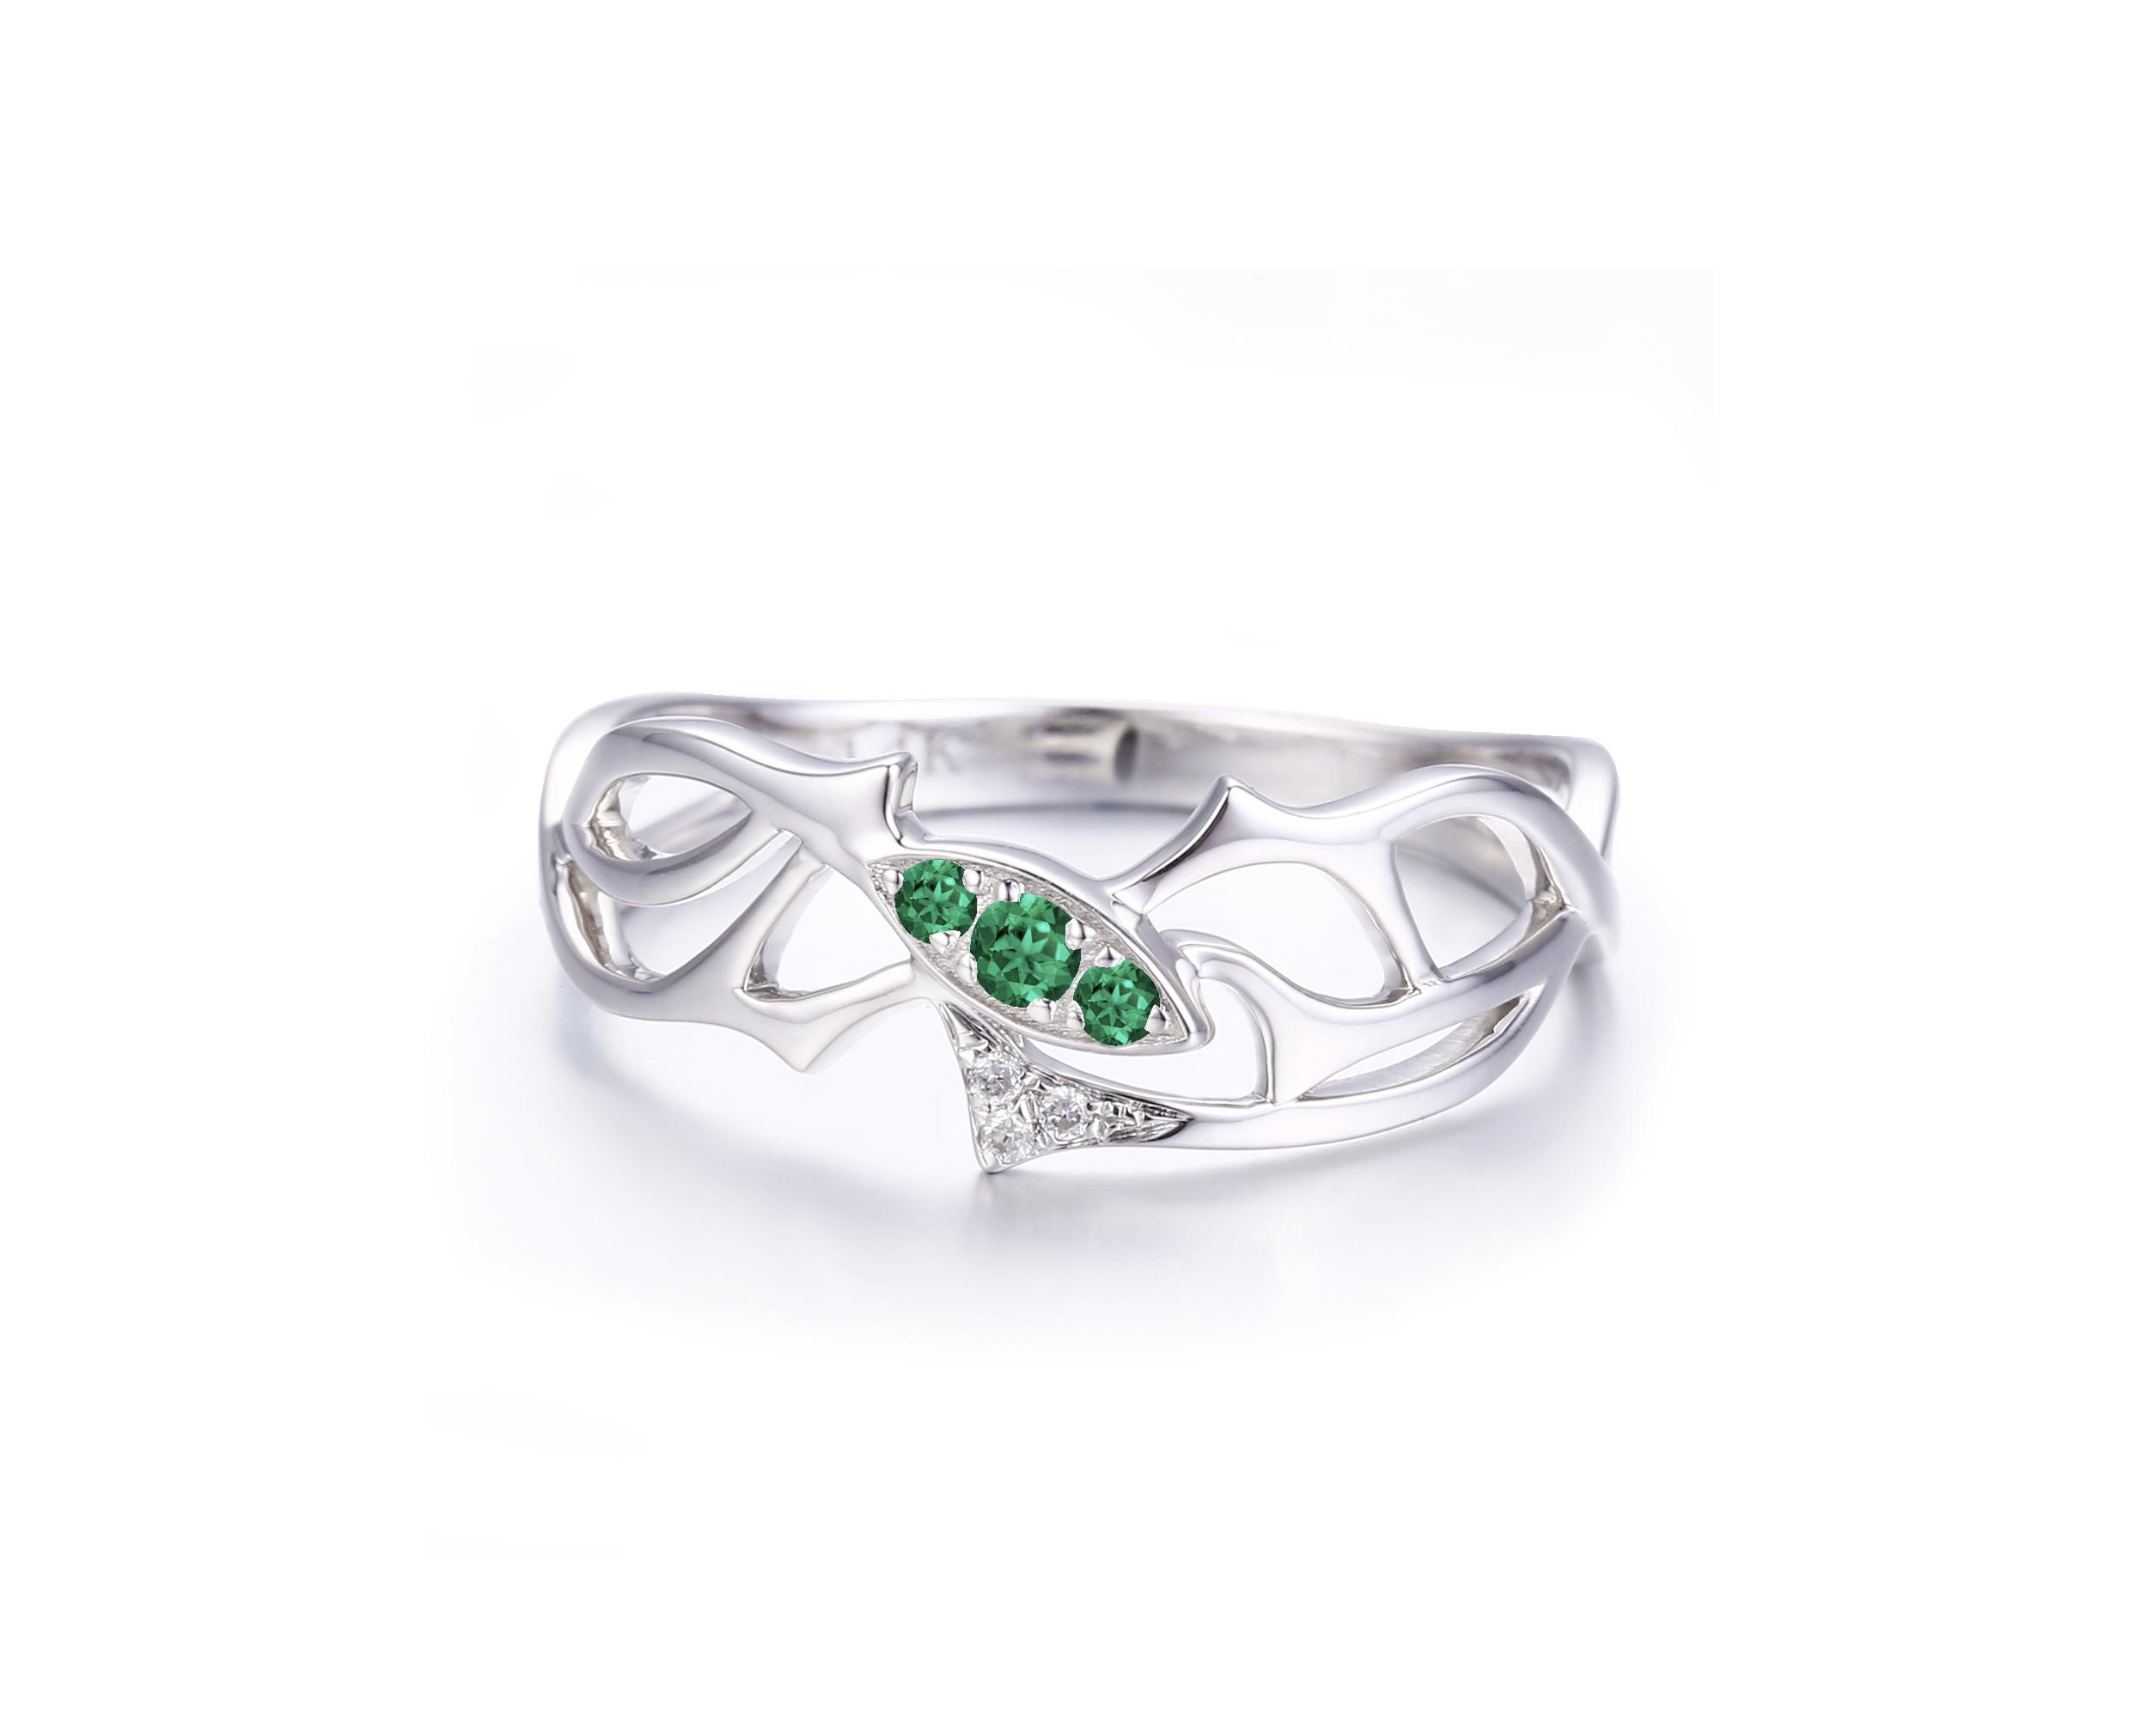 detail-1 - emerald.jpg